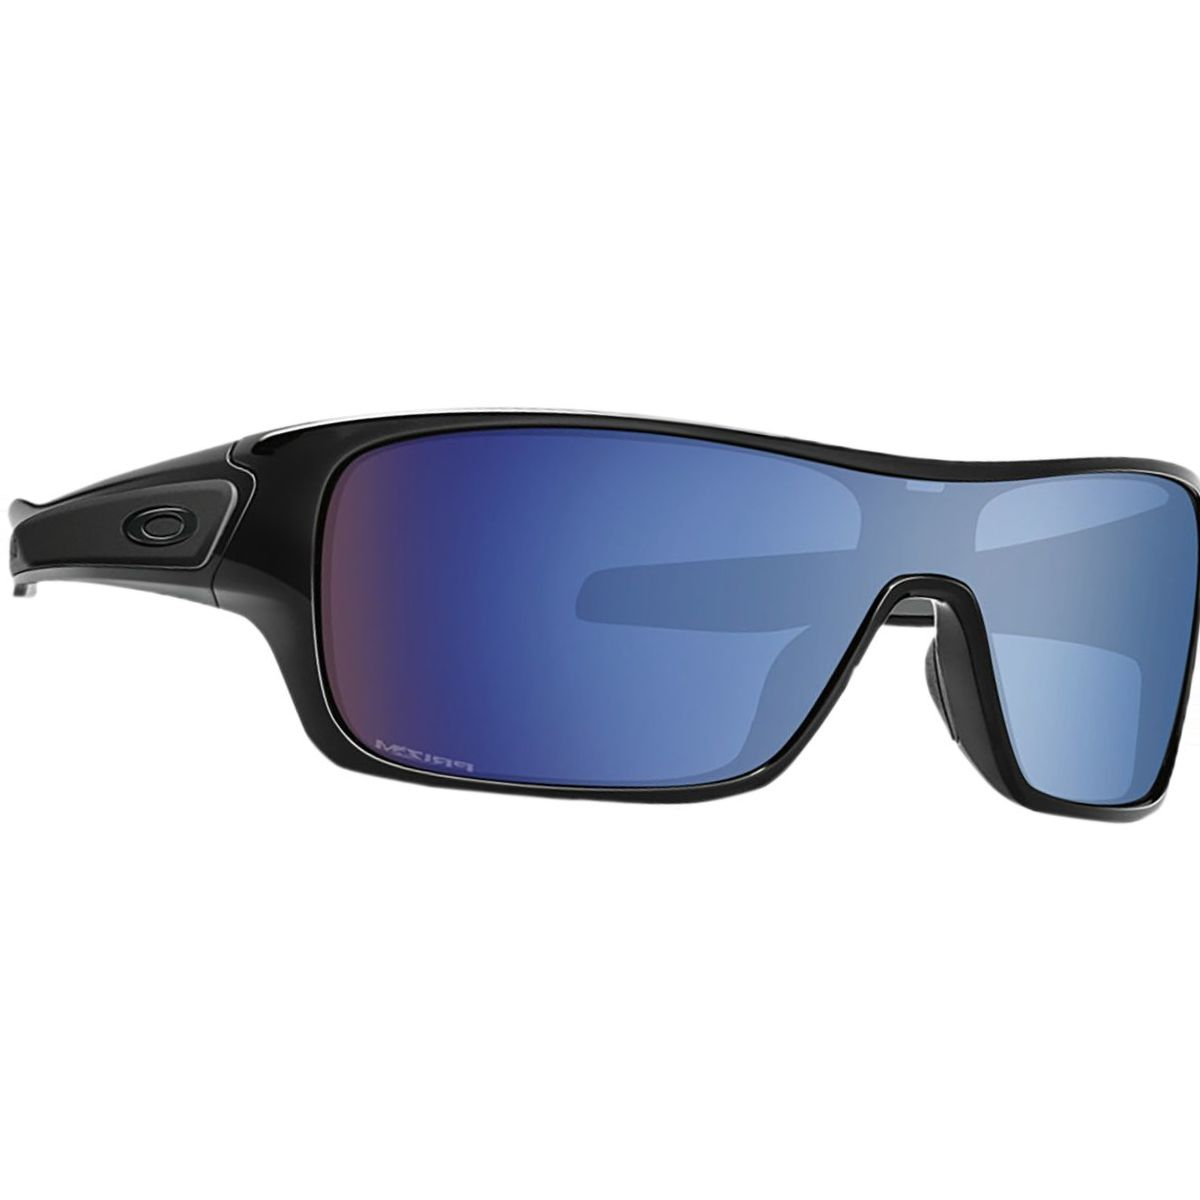 Oakley Turbine Rotor Prizm Sunglasses - Men's